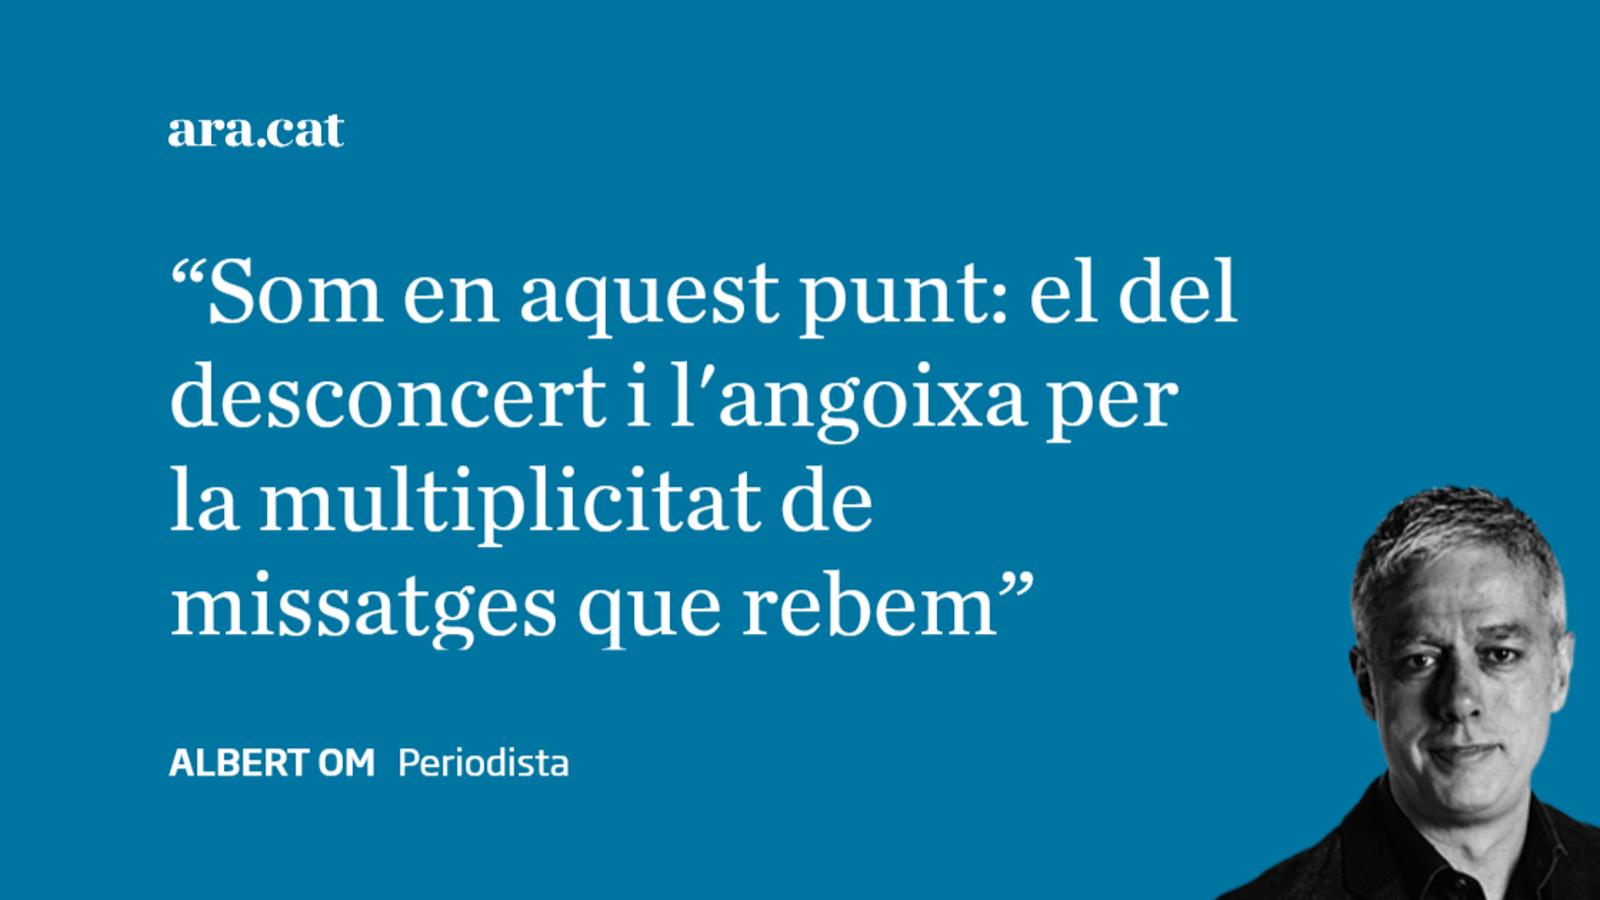 Carta a Jaume Padrós: 'Doctor, què ens passa?'